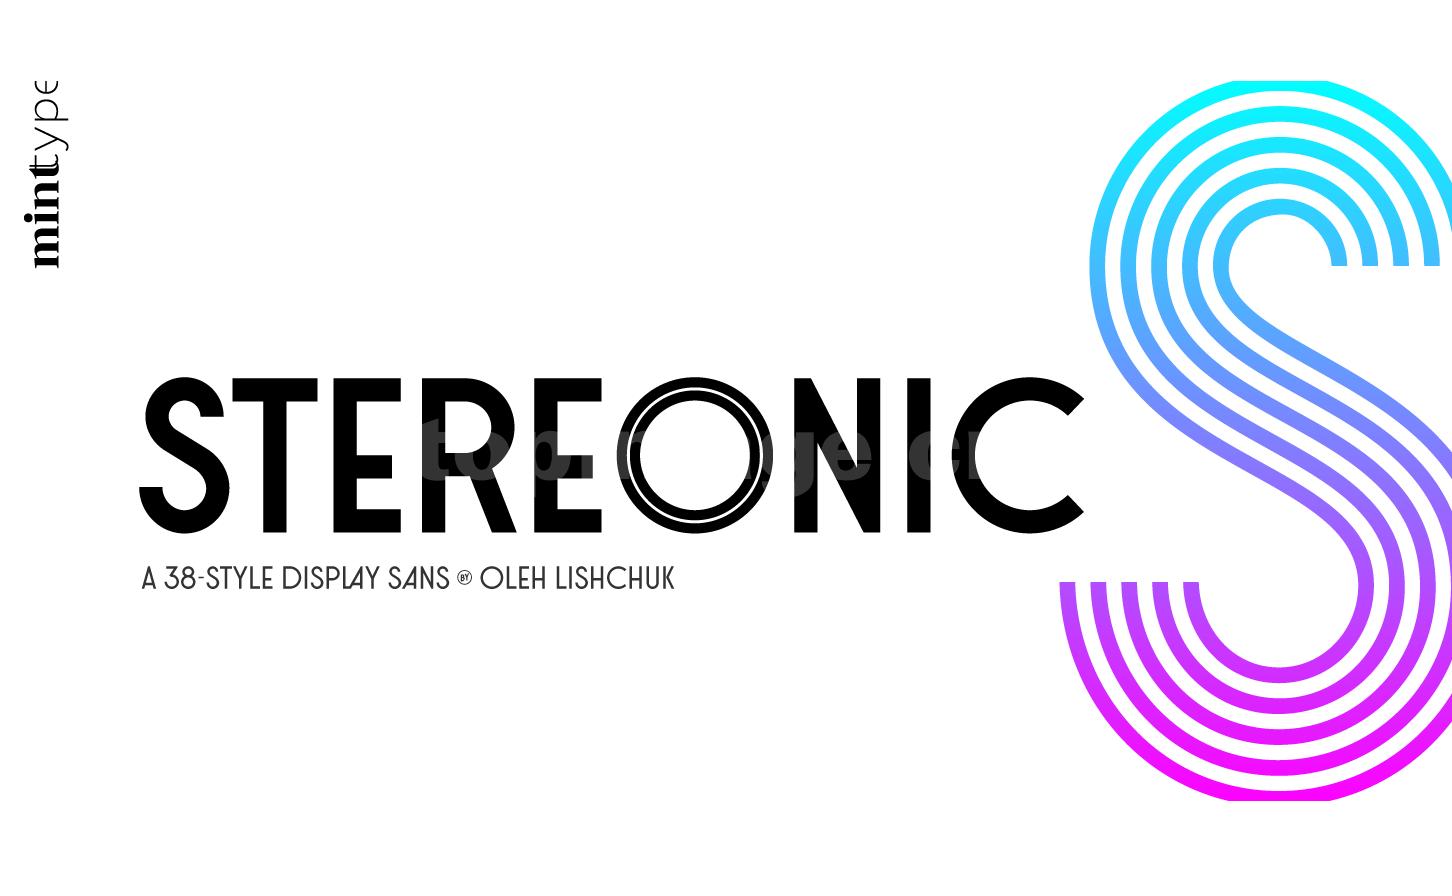 Stereonic时尚简约个性化海报质感logo设计英文字体